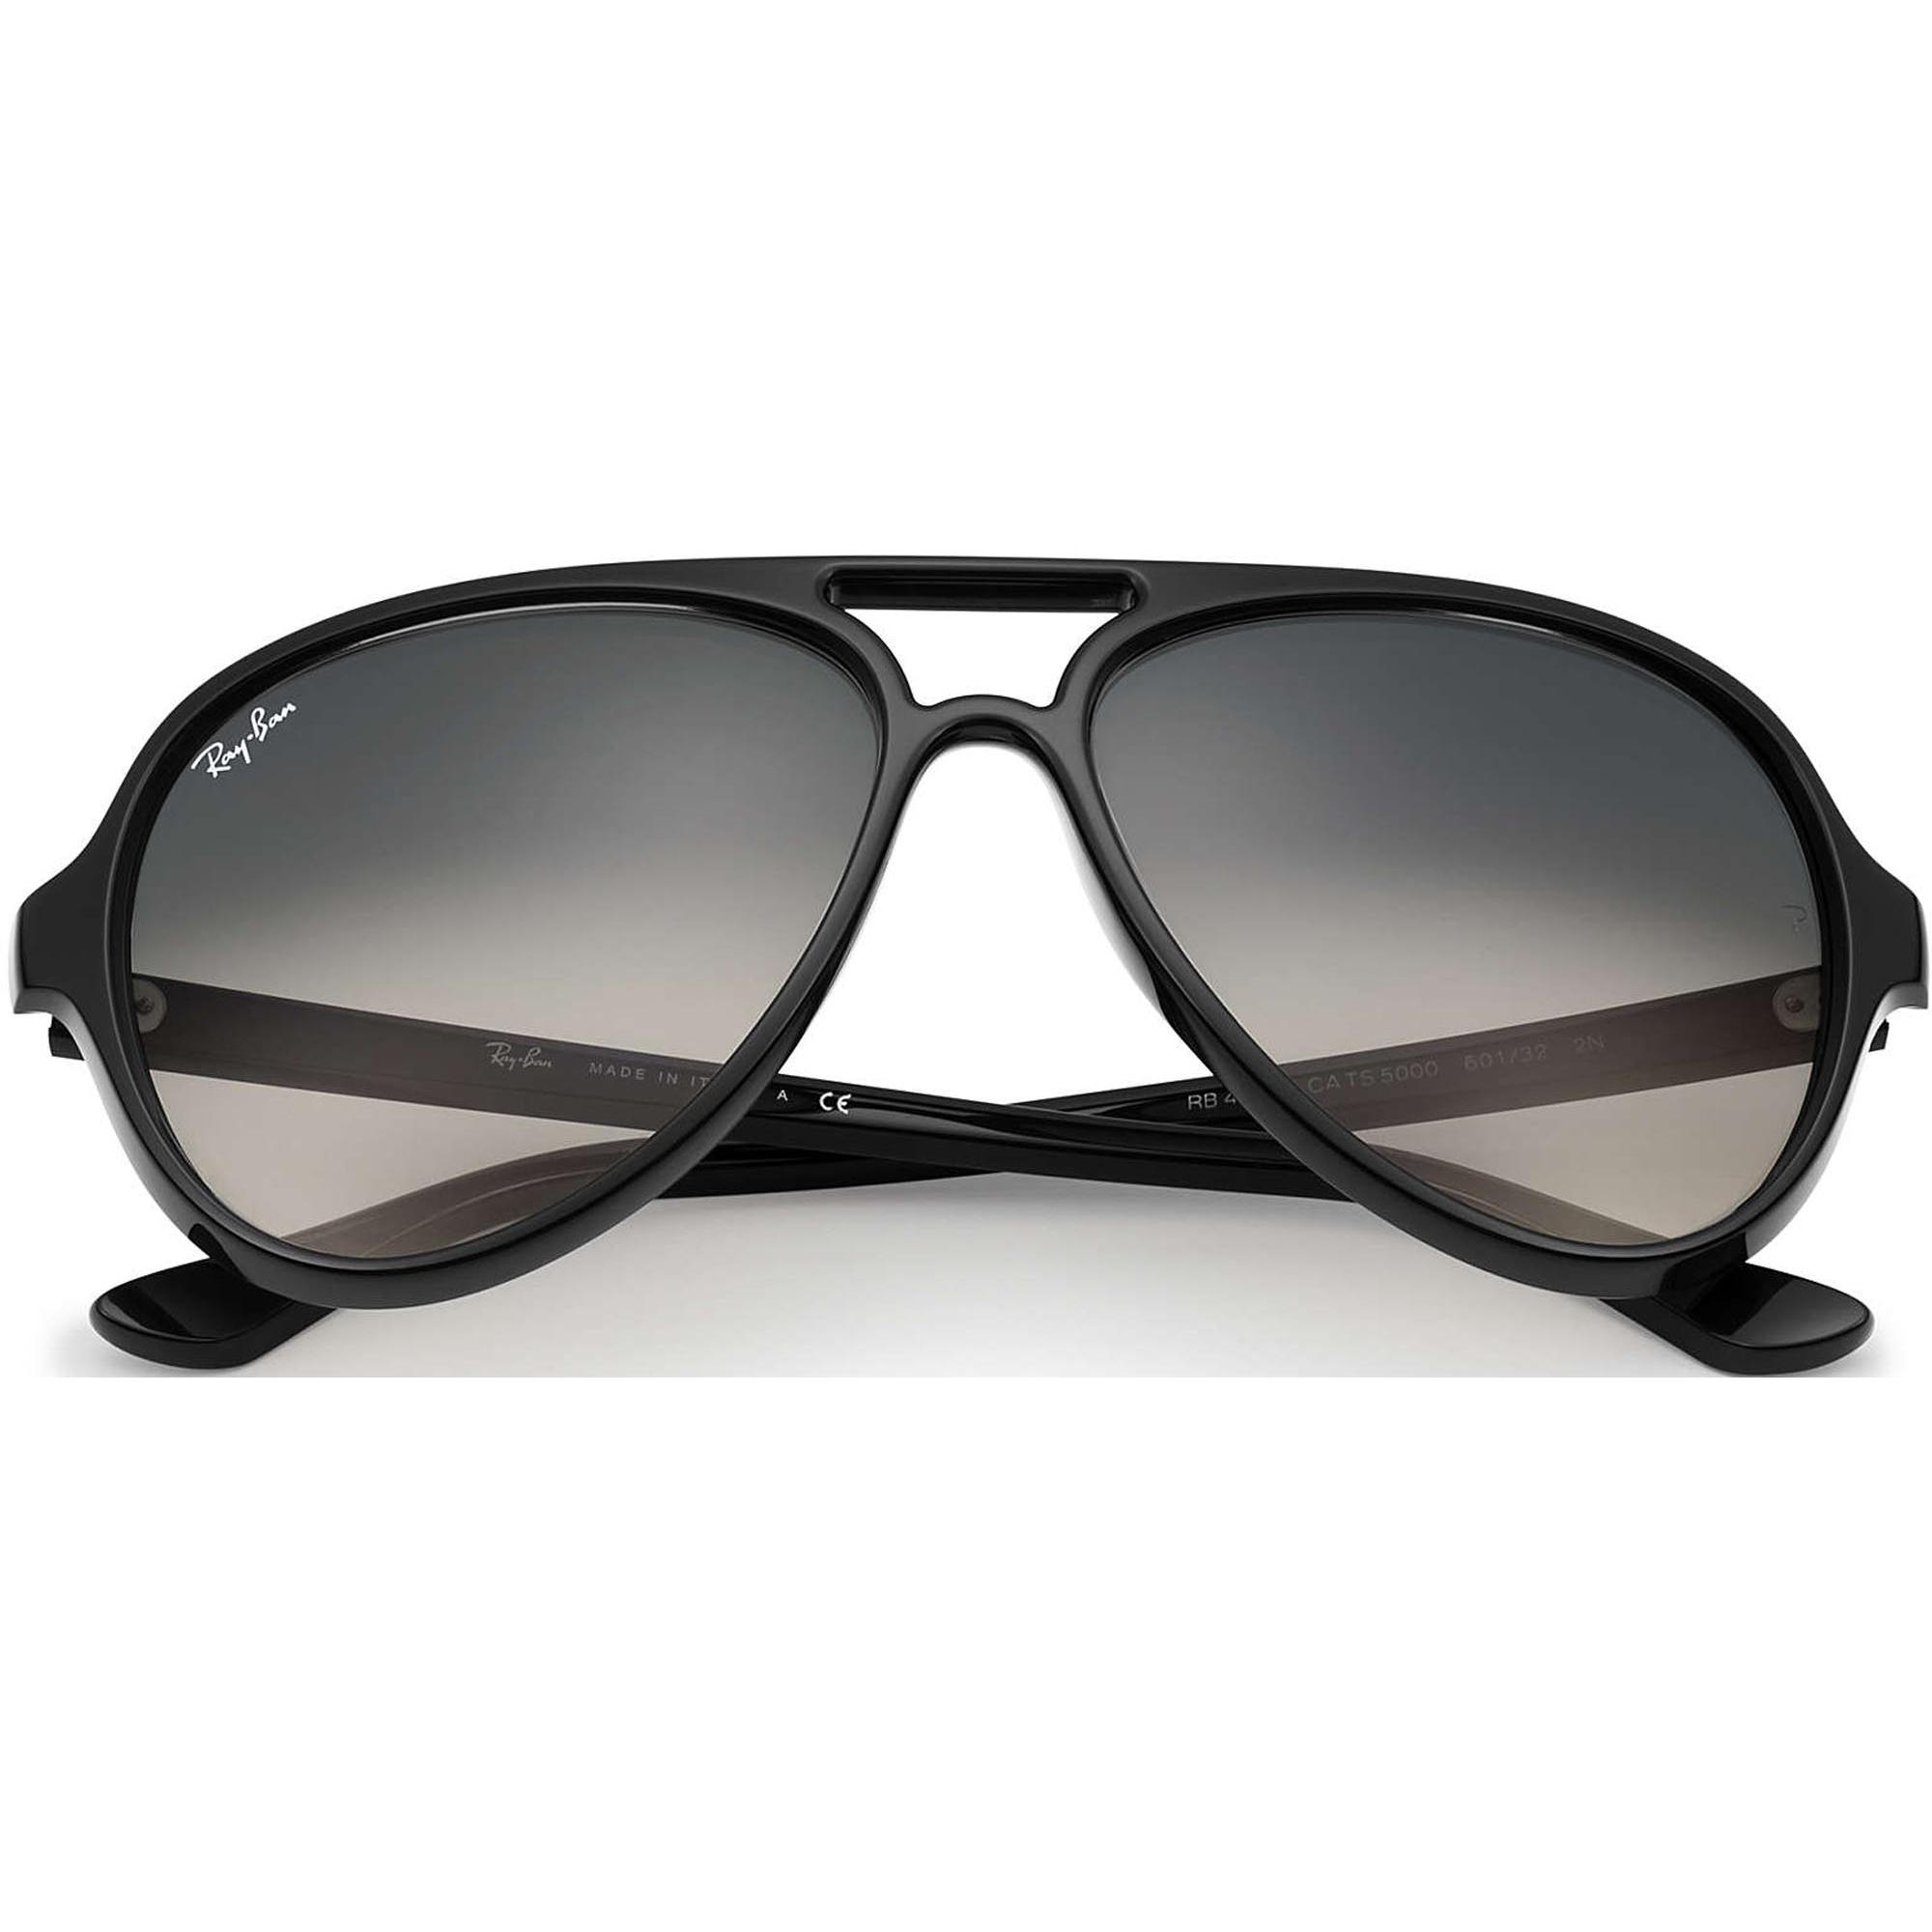 1c7085692 Ray Ban Sunglasses Cats 5000 Black Crystal Sunglasses RB4125 601/32